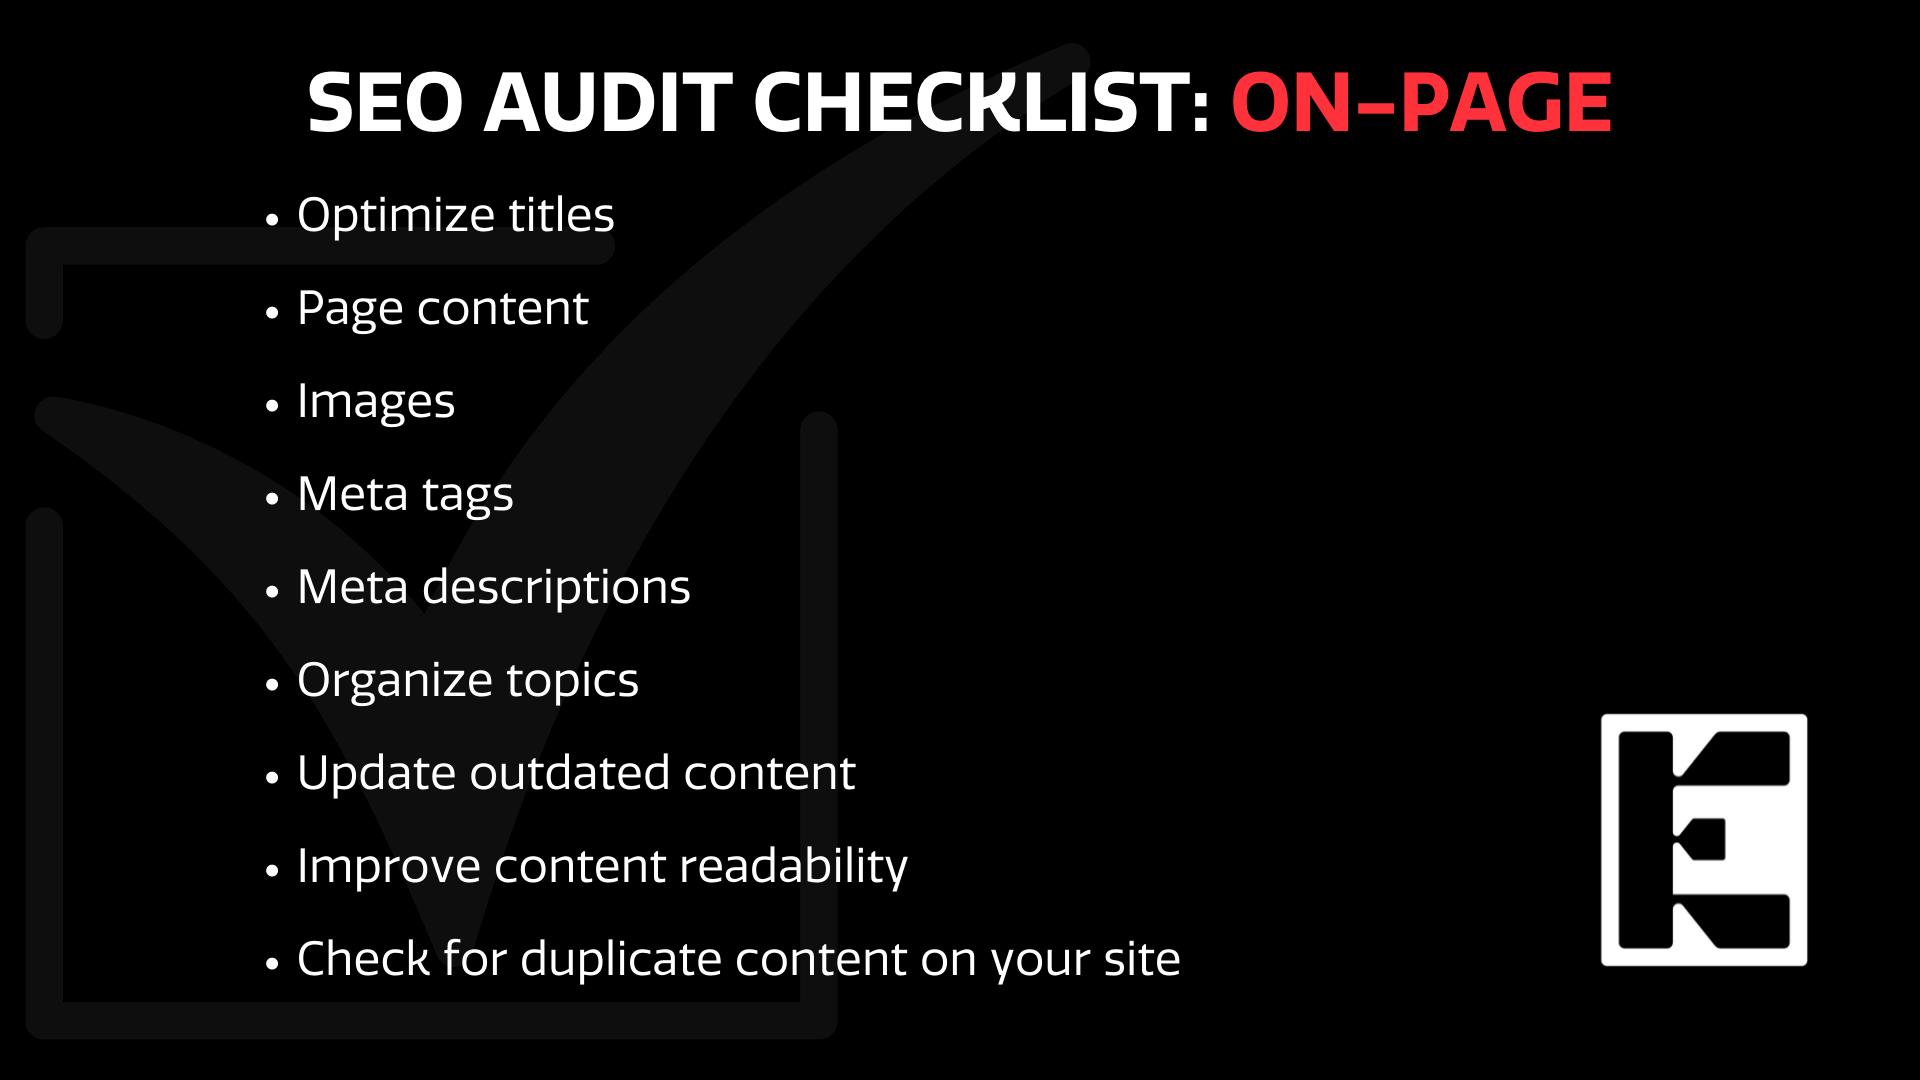 SEO on page checklist